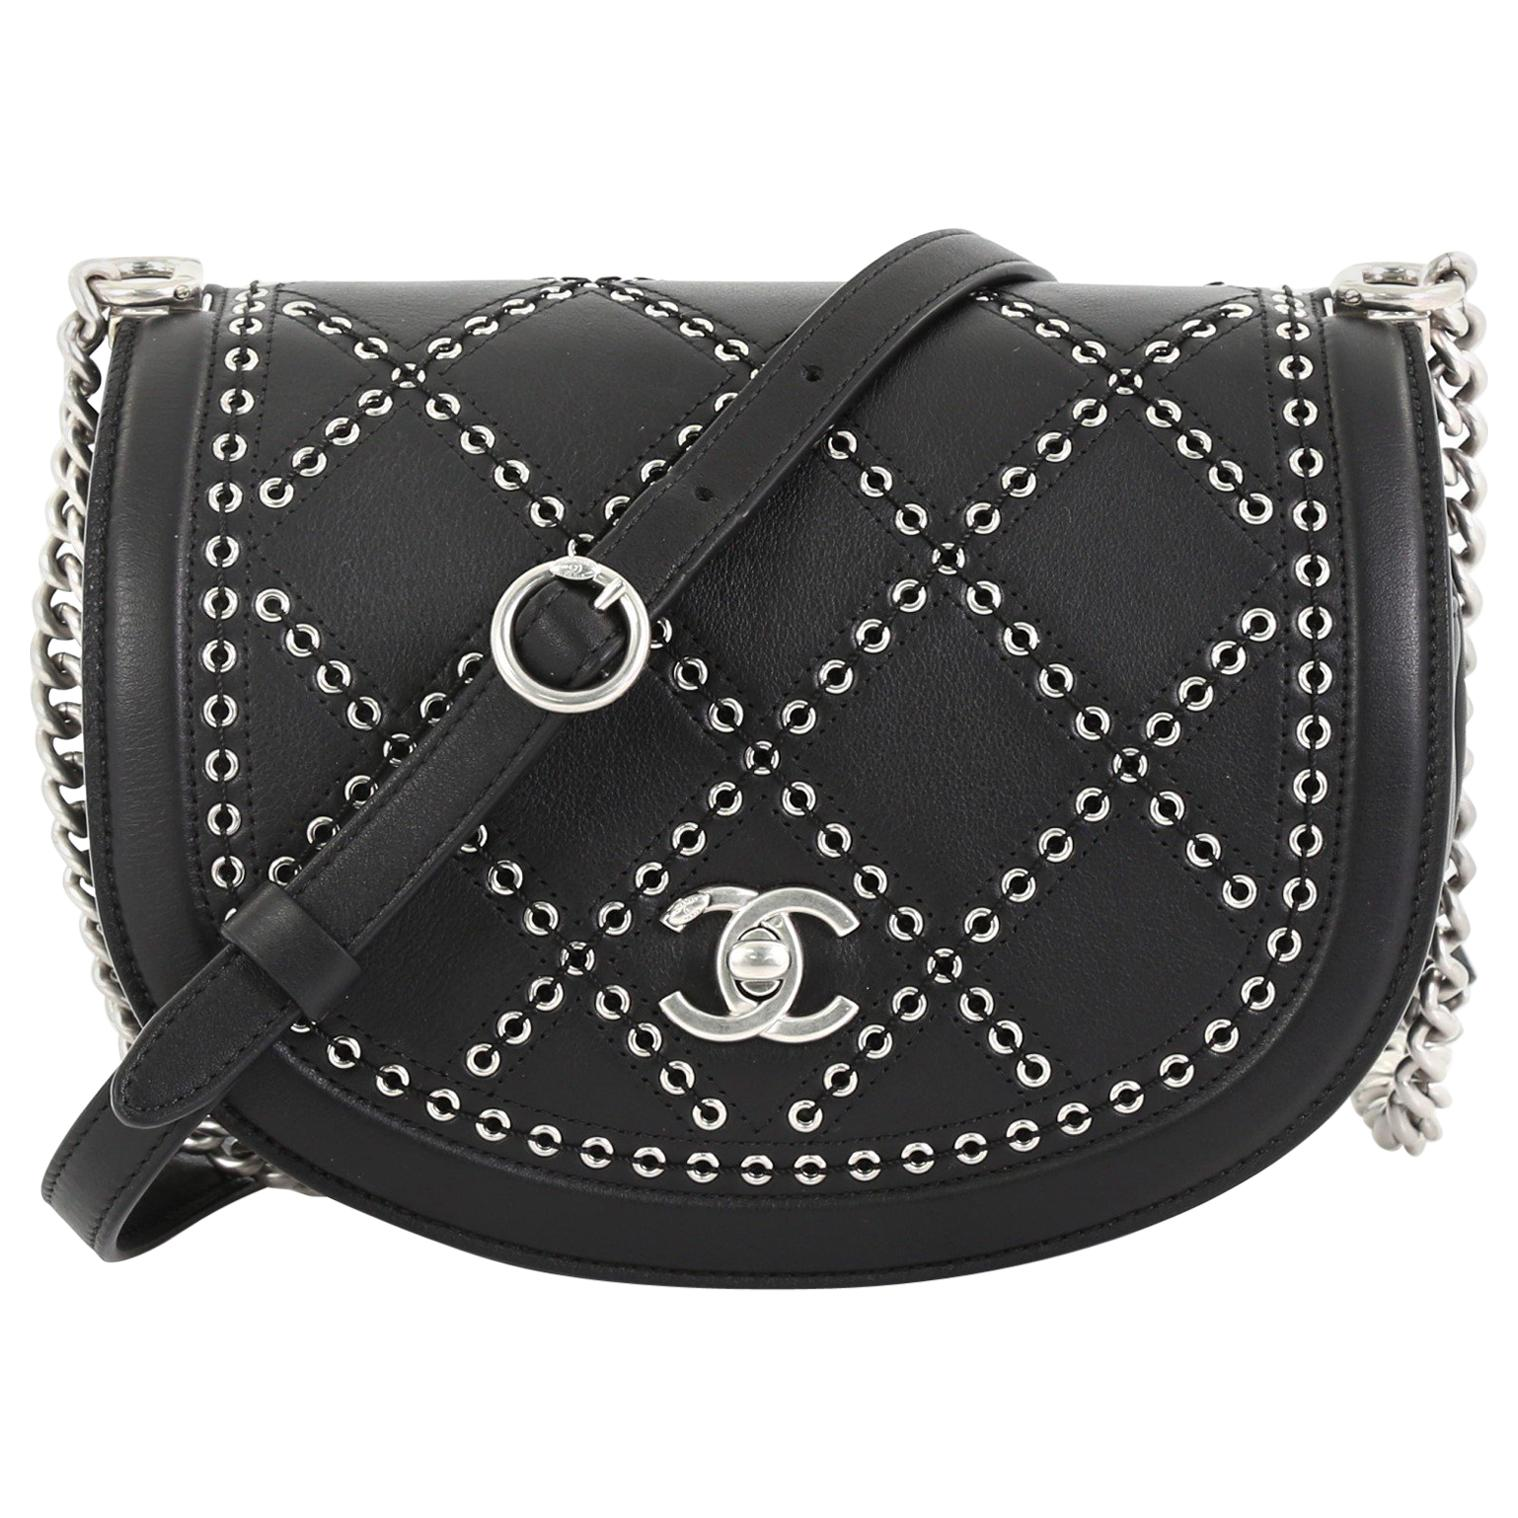 977e1208e0ed9e Vintage Chanel Crossbody Bags and Messenger Bags - 645 For Sale at 1stdibs